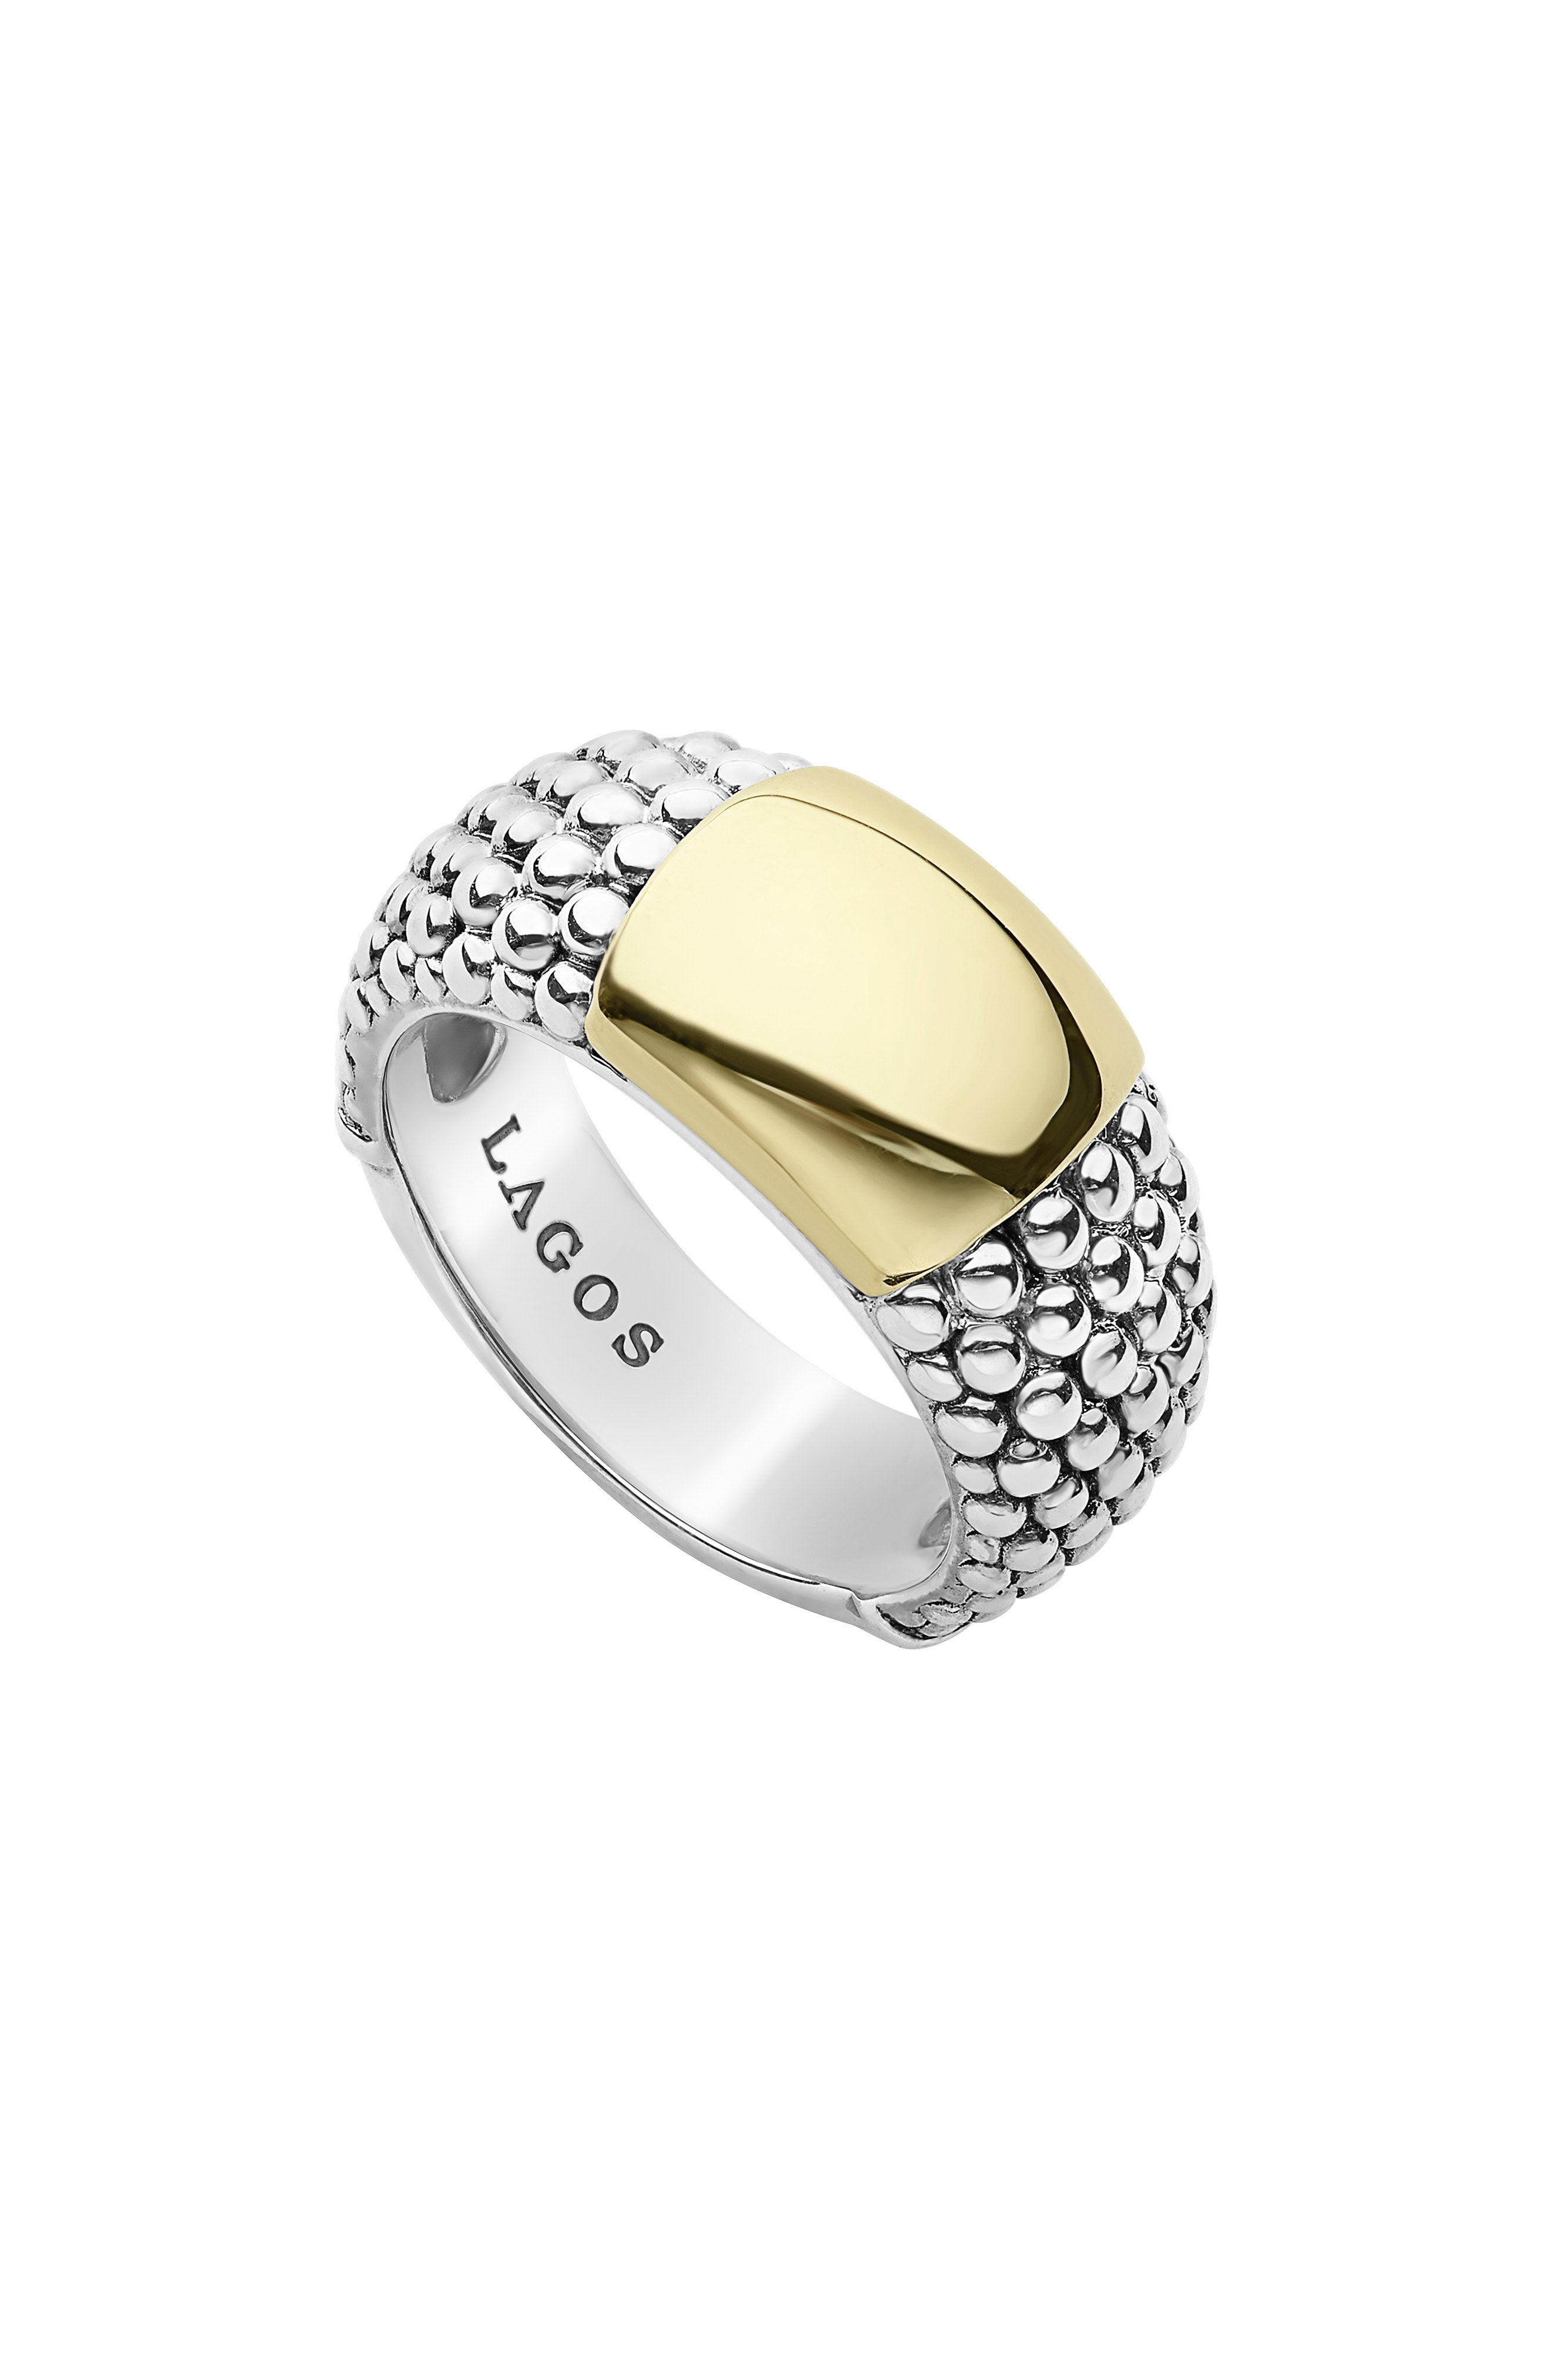 LAGOS Signature Caviar High Bar Ring available at